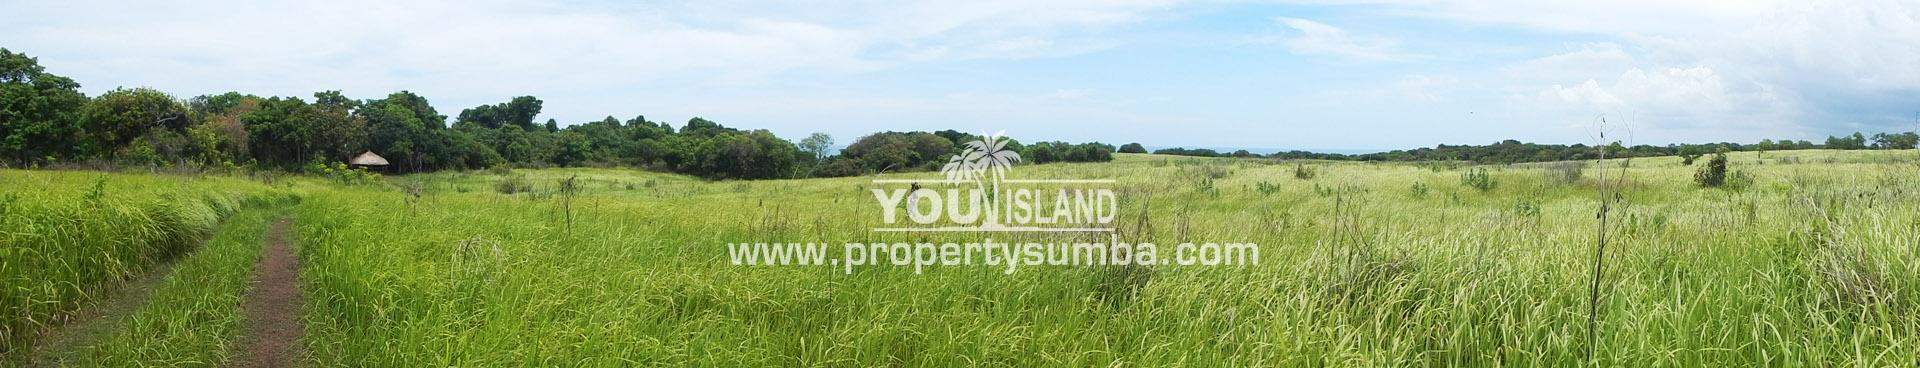 Land 28 Tanamete 63990 M2 11